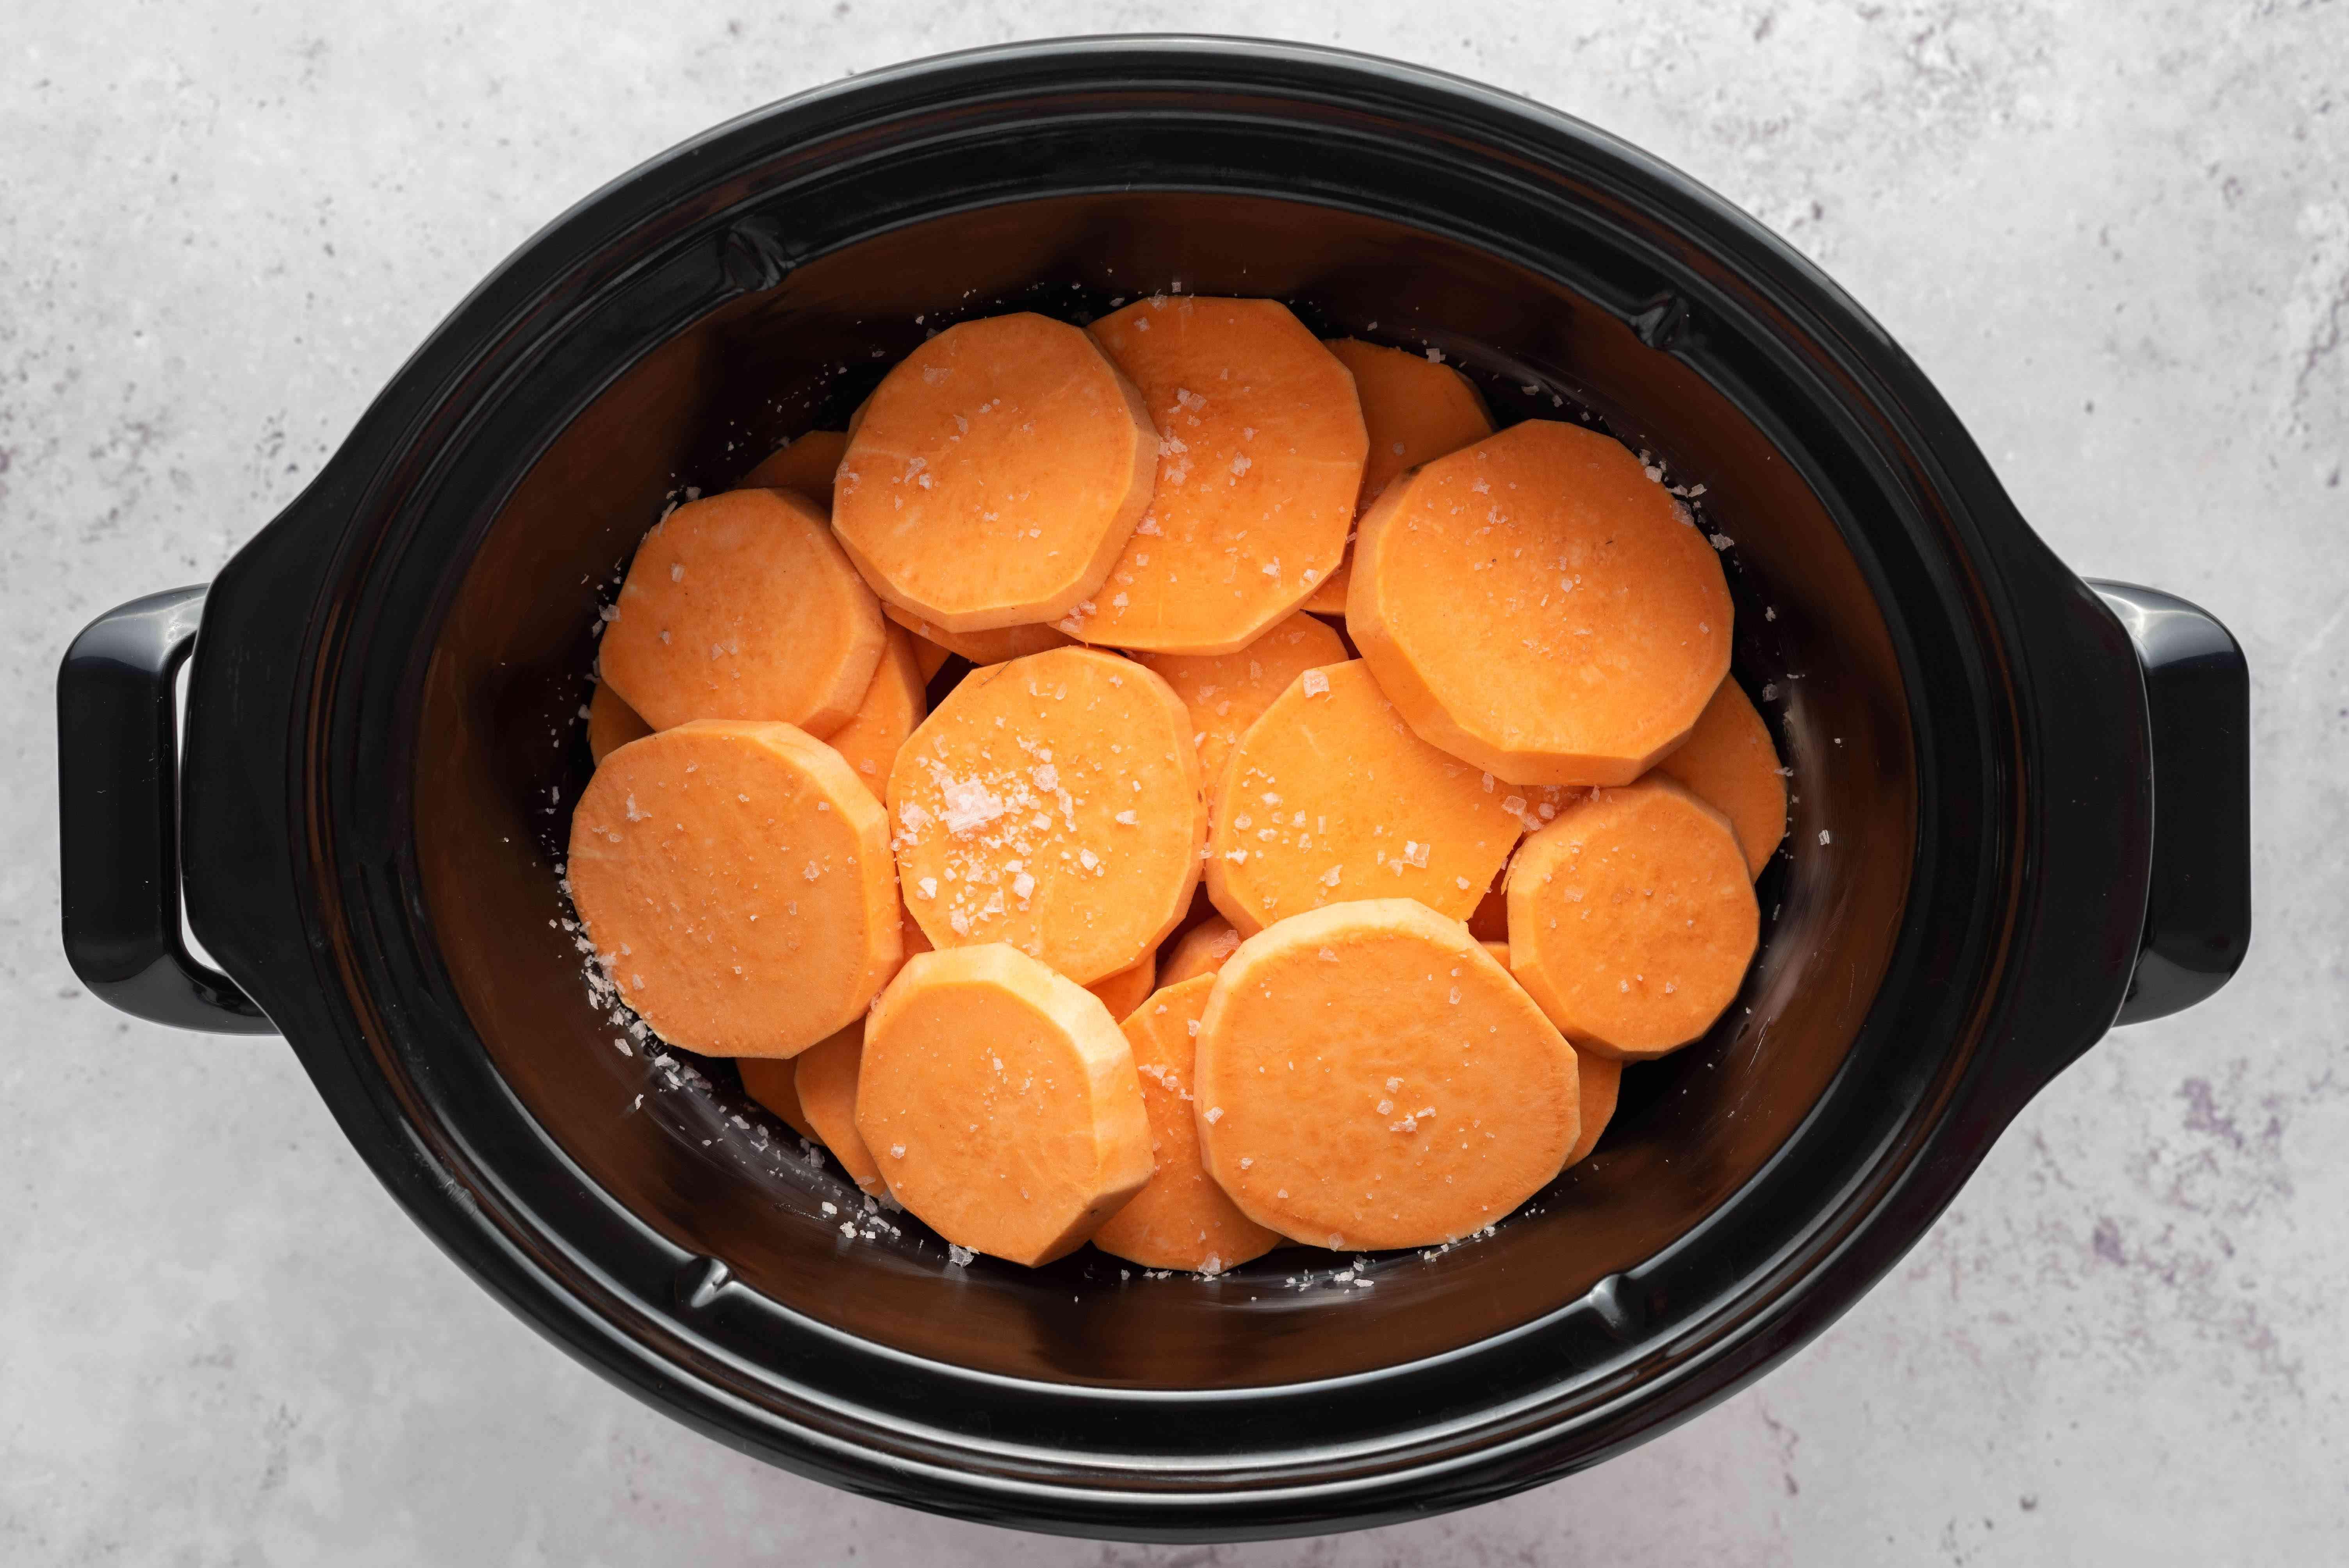 sliced sweet potatoes sprinkled with salt in a crockpot